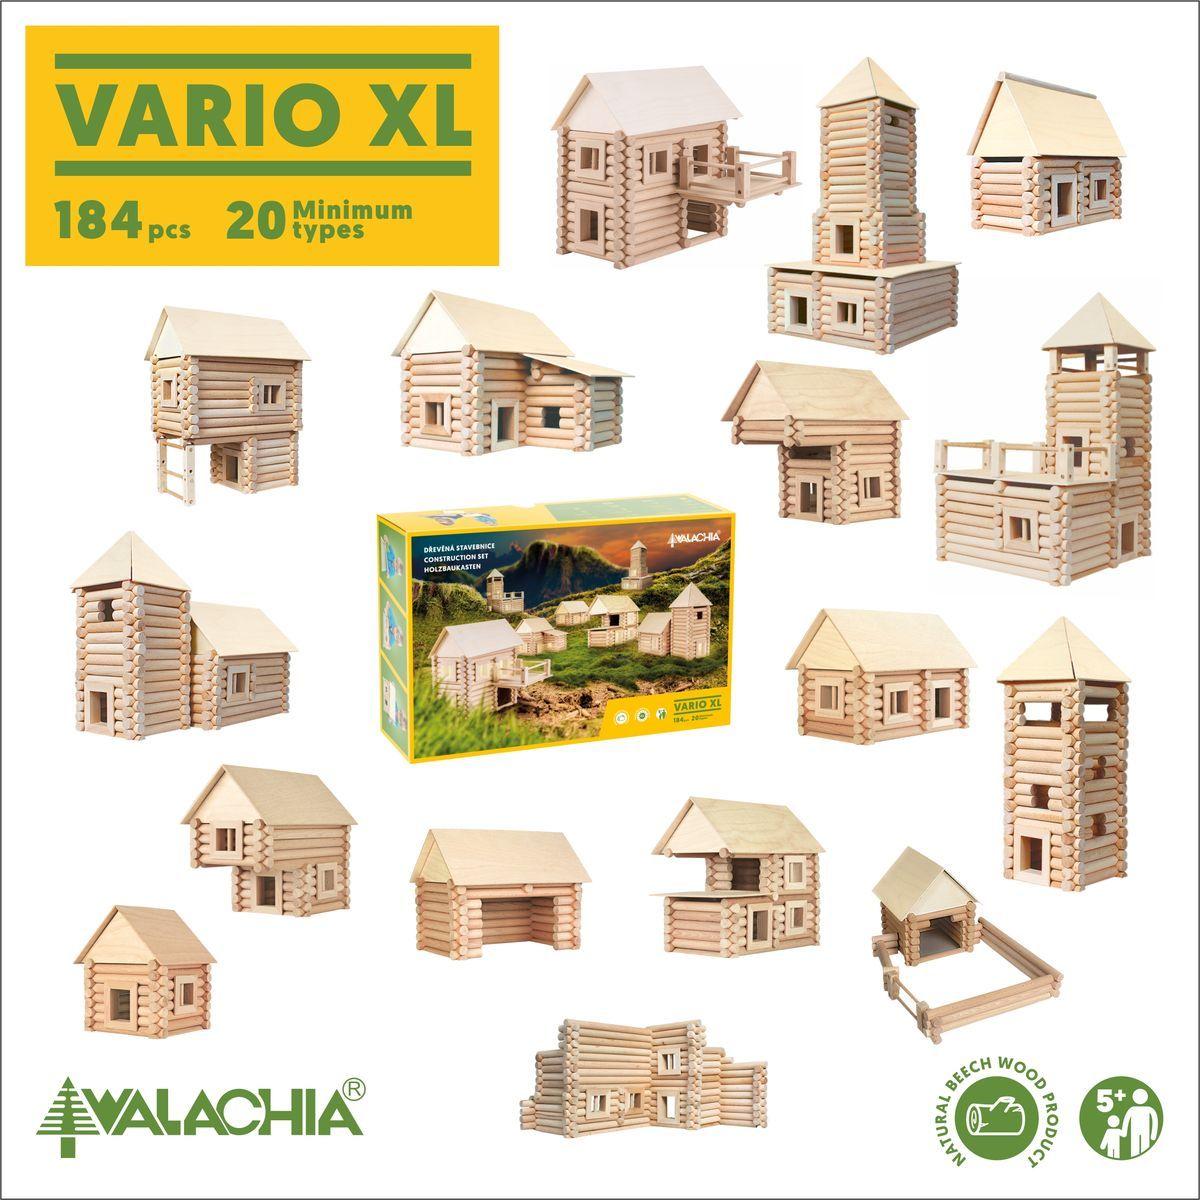 Walachia W21 Vario XL